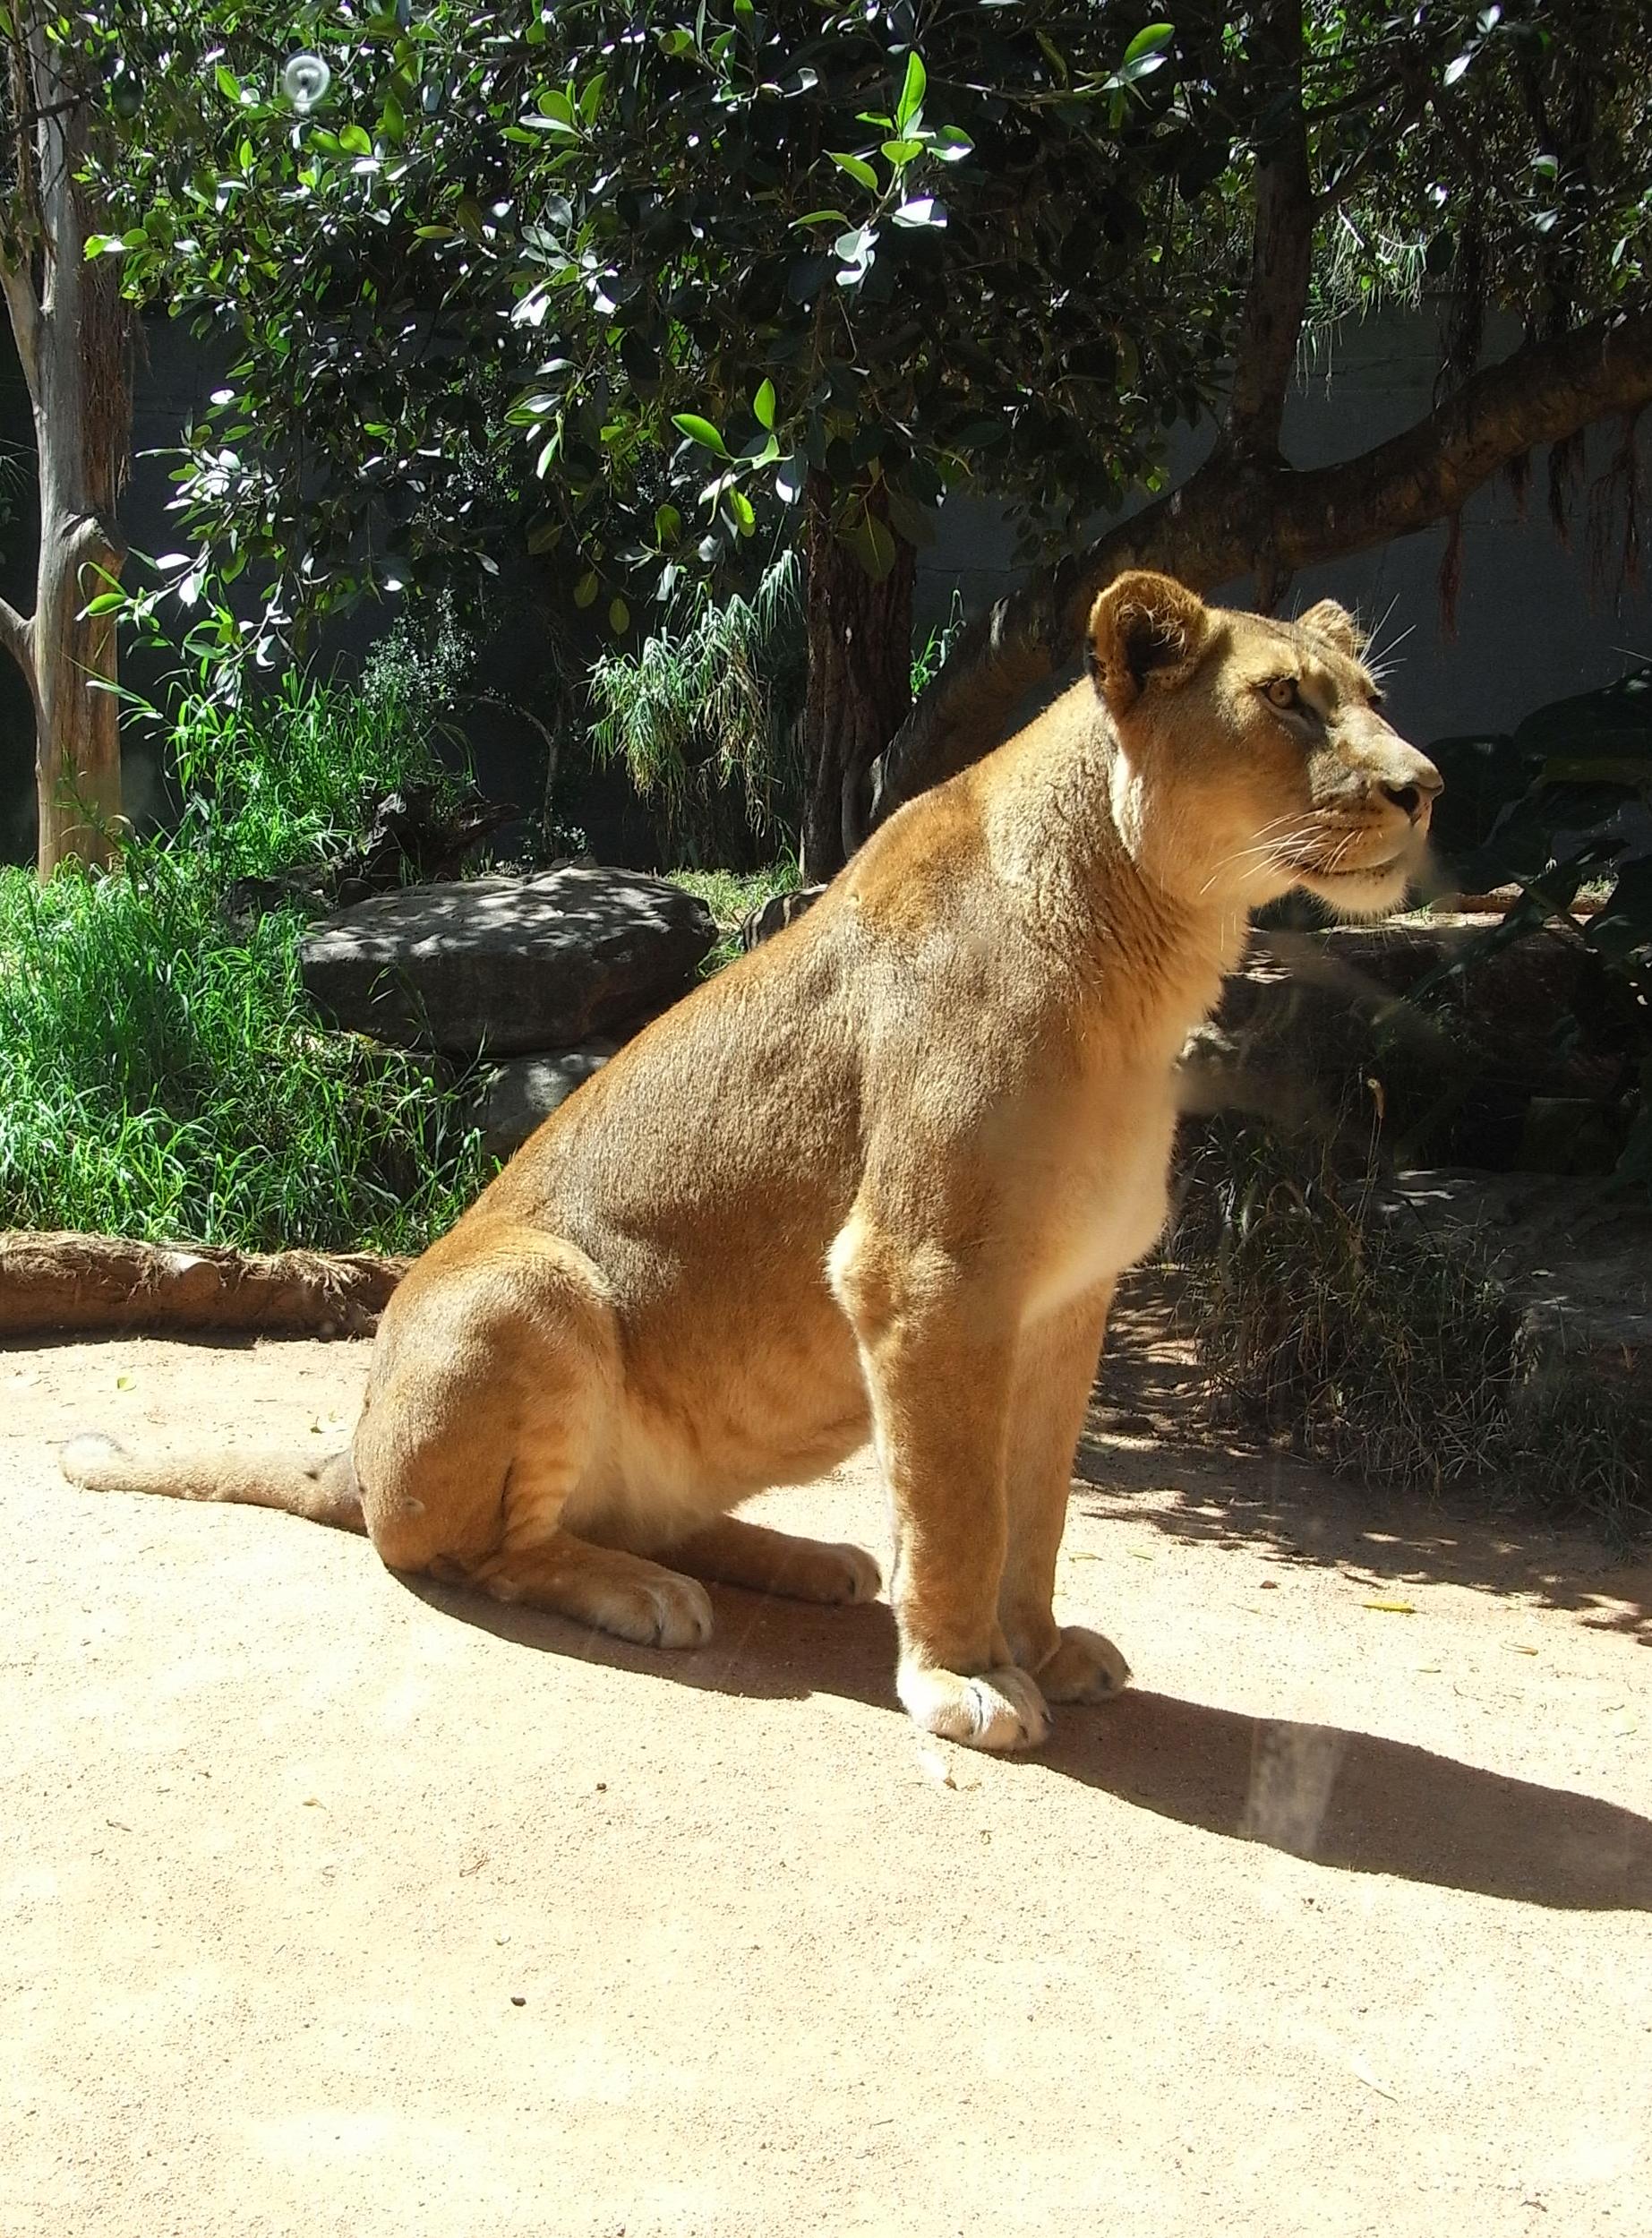 Lioness, Big, Carnivore, Cat, Dangerous, HQ Photo